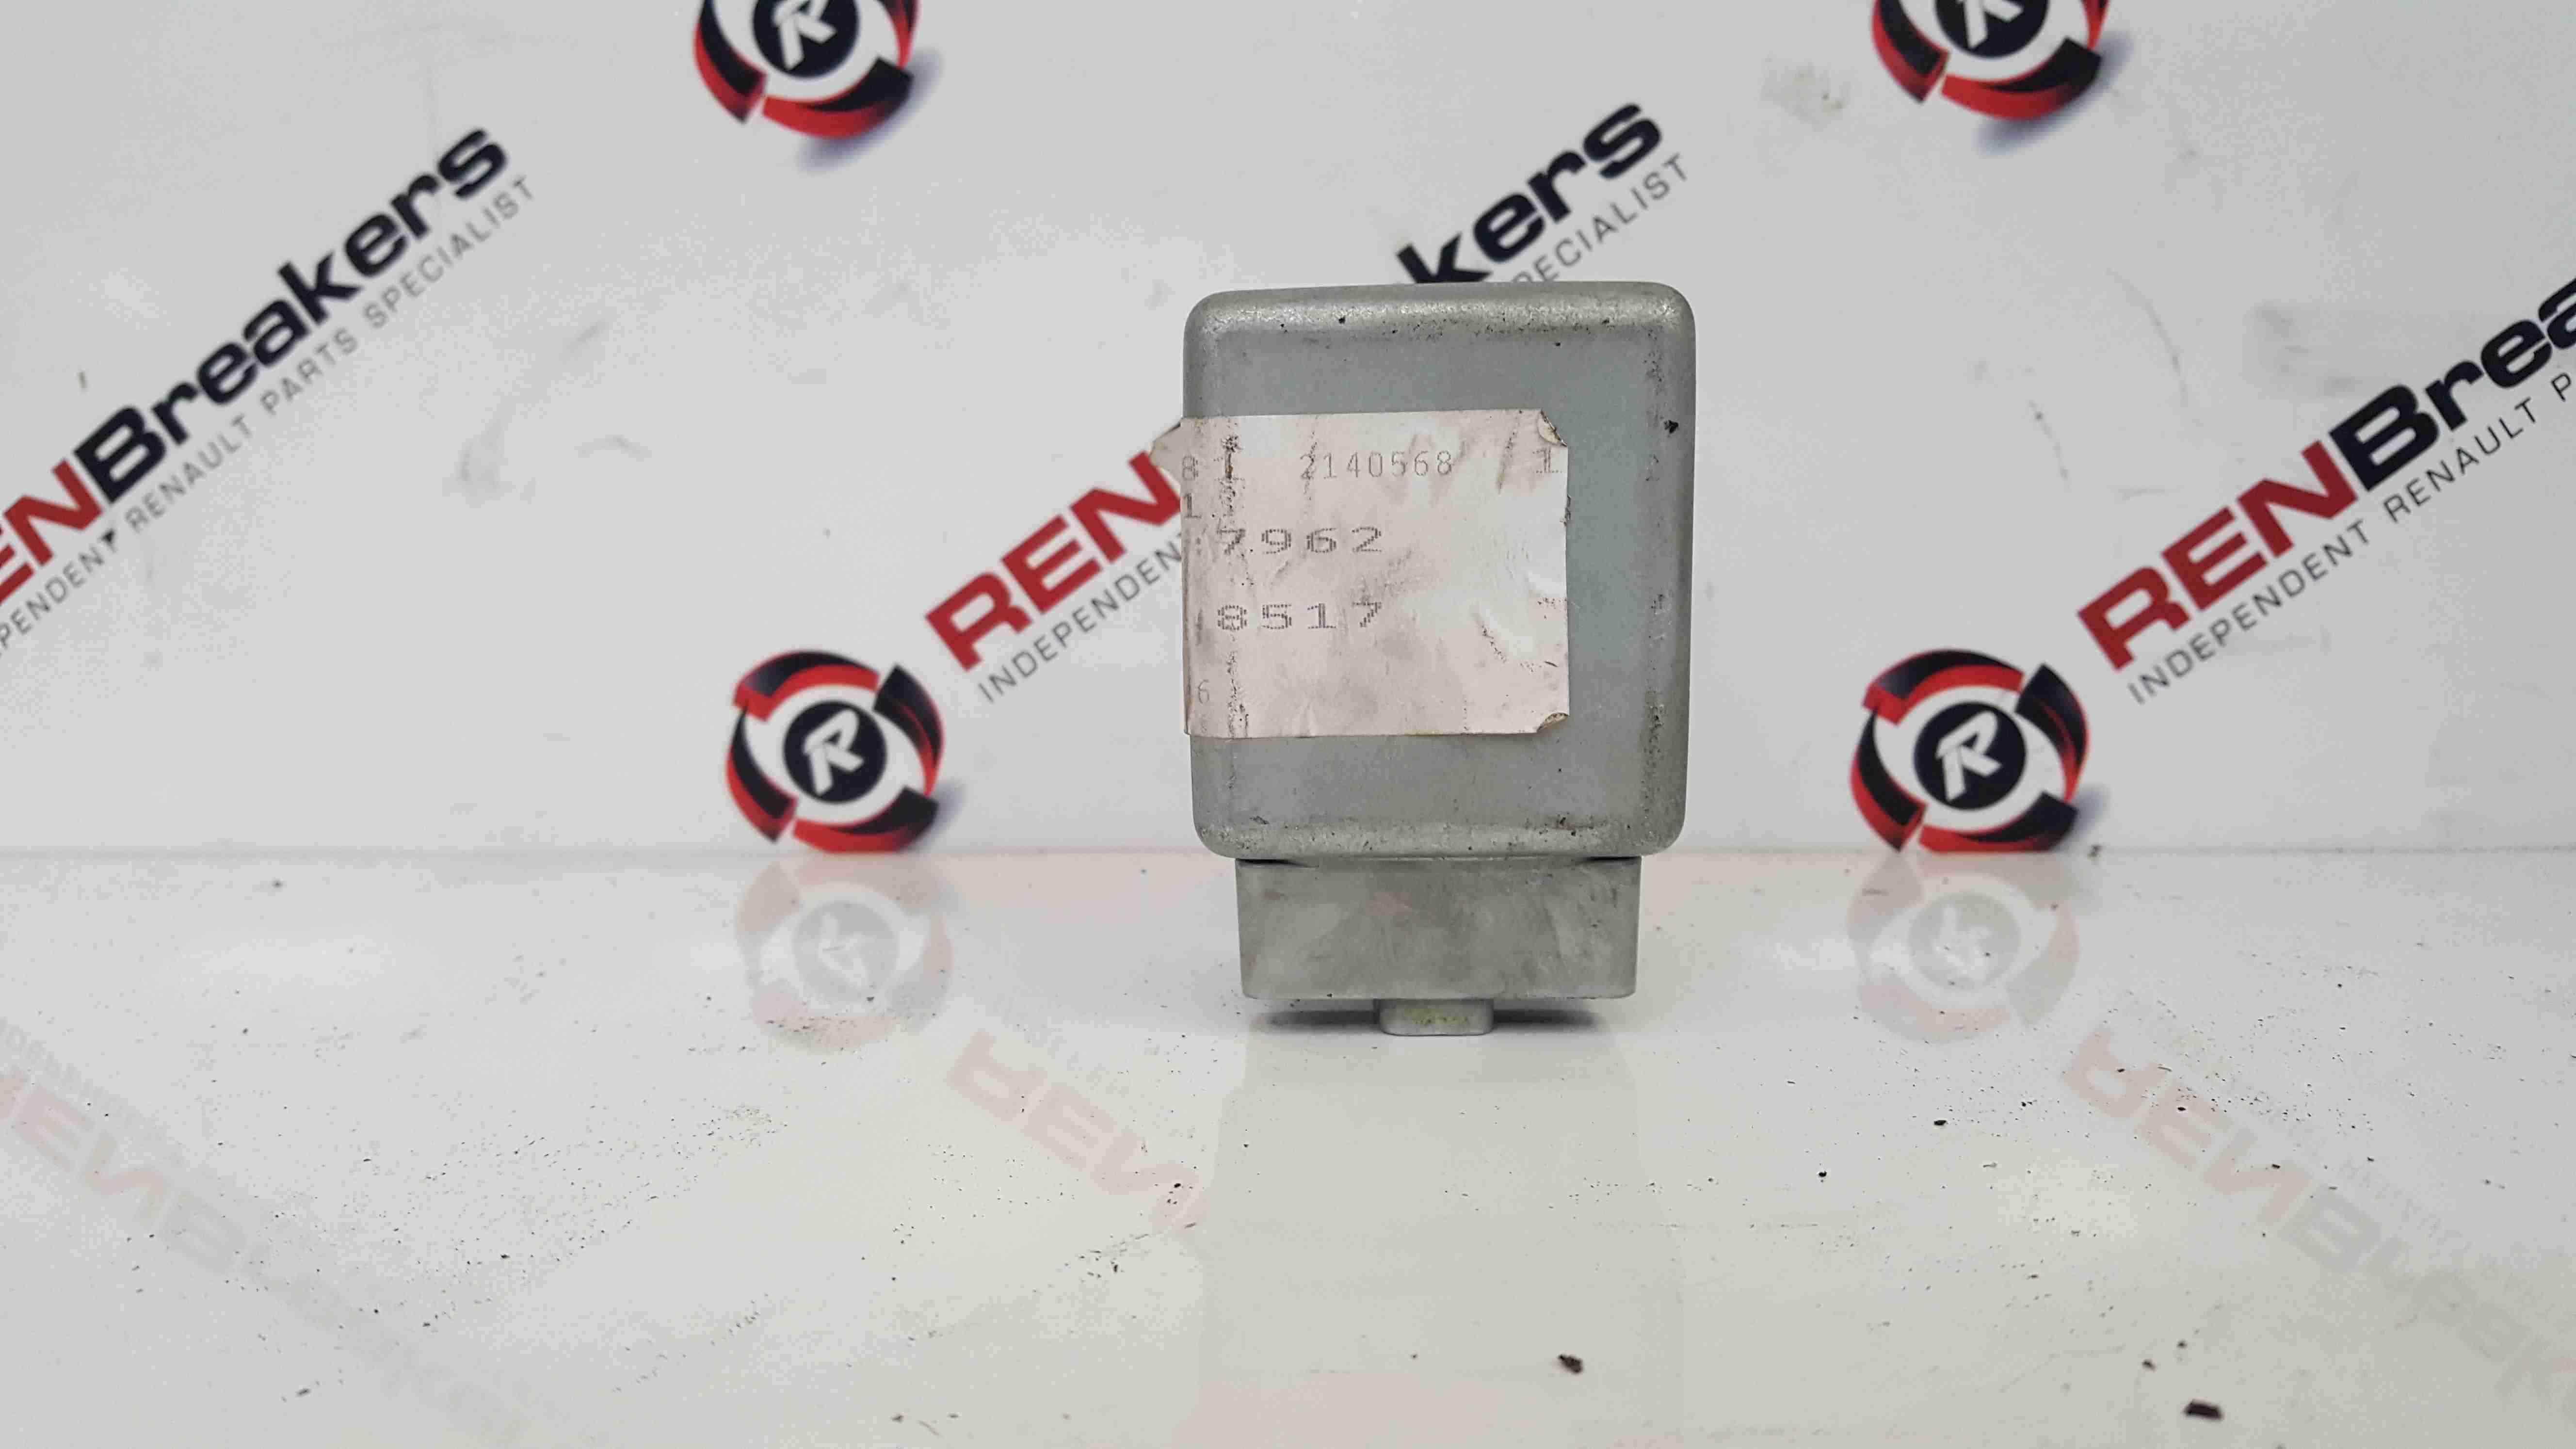 Renault Espace + Laguna  2003-2013 Steering Column Lock Box DECODED VIRGINILISED